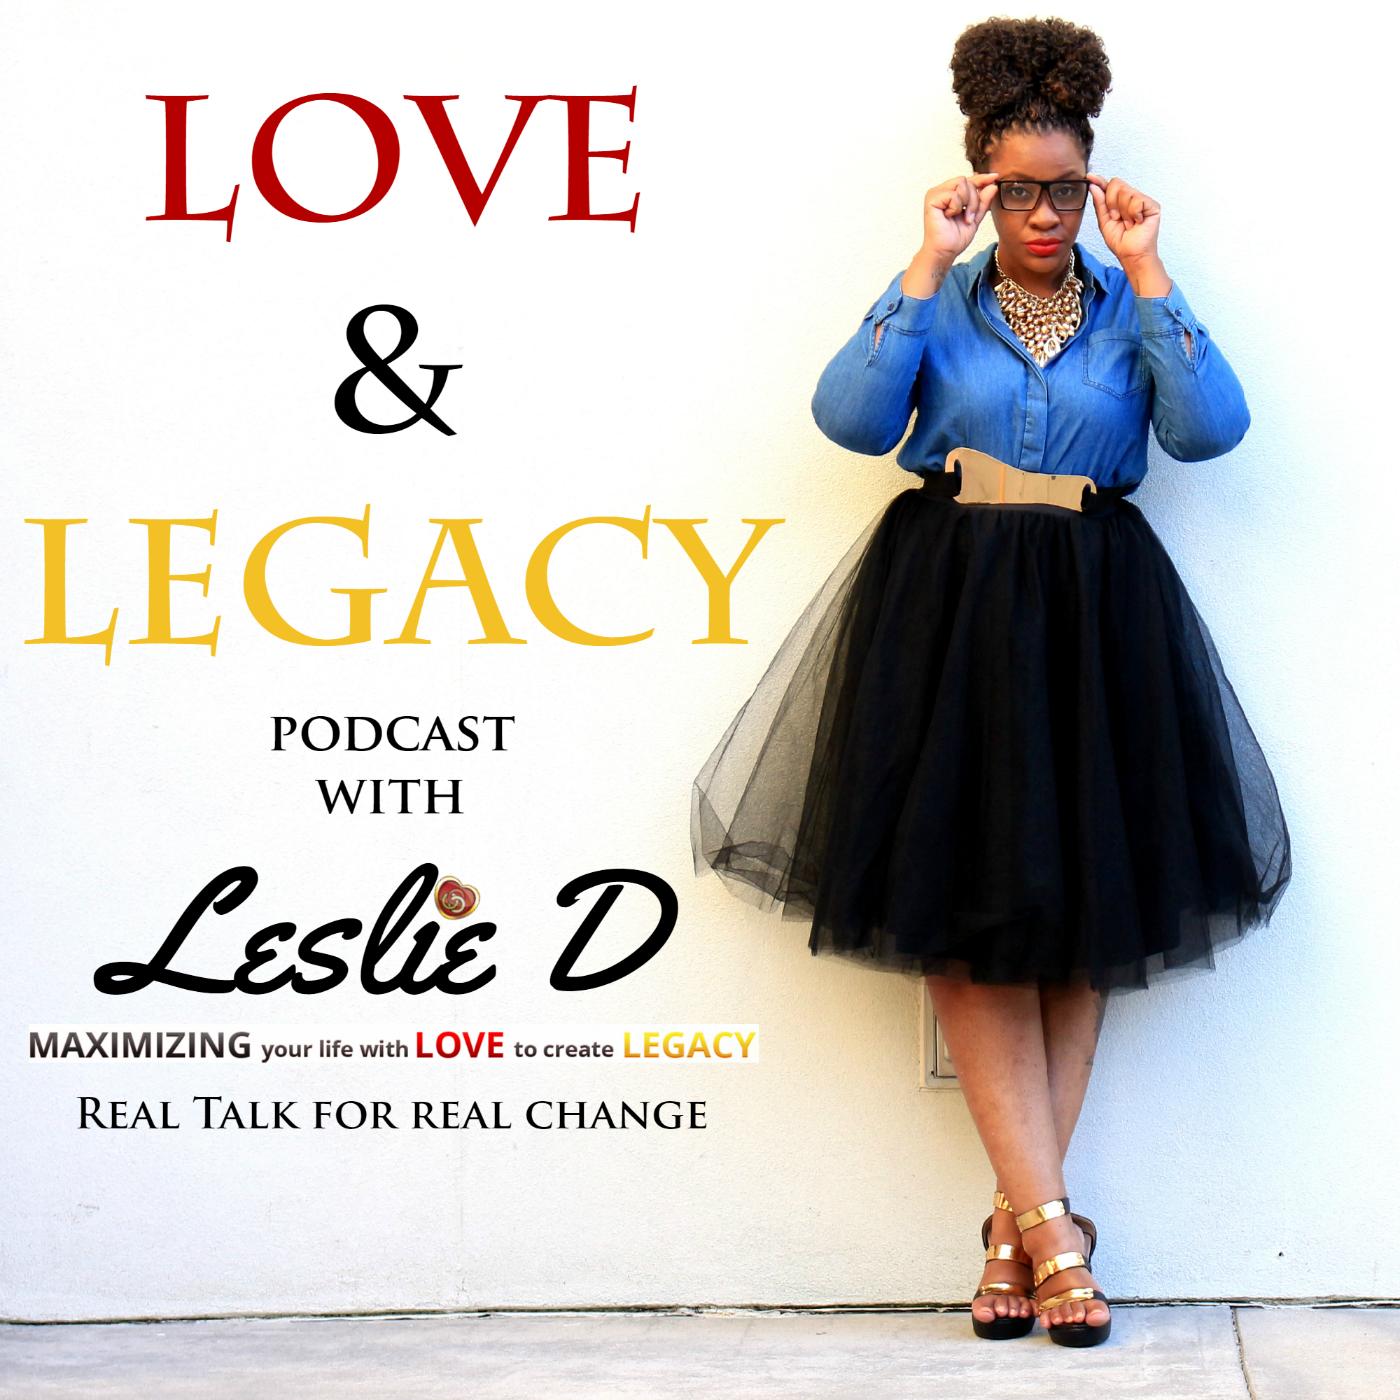 Podcast - Love & Legacy Strategist | Author | Speaker |